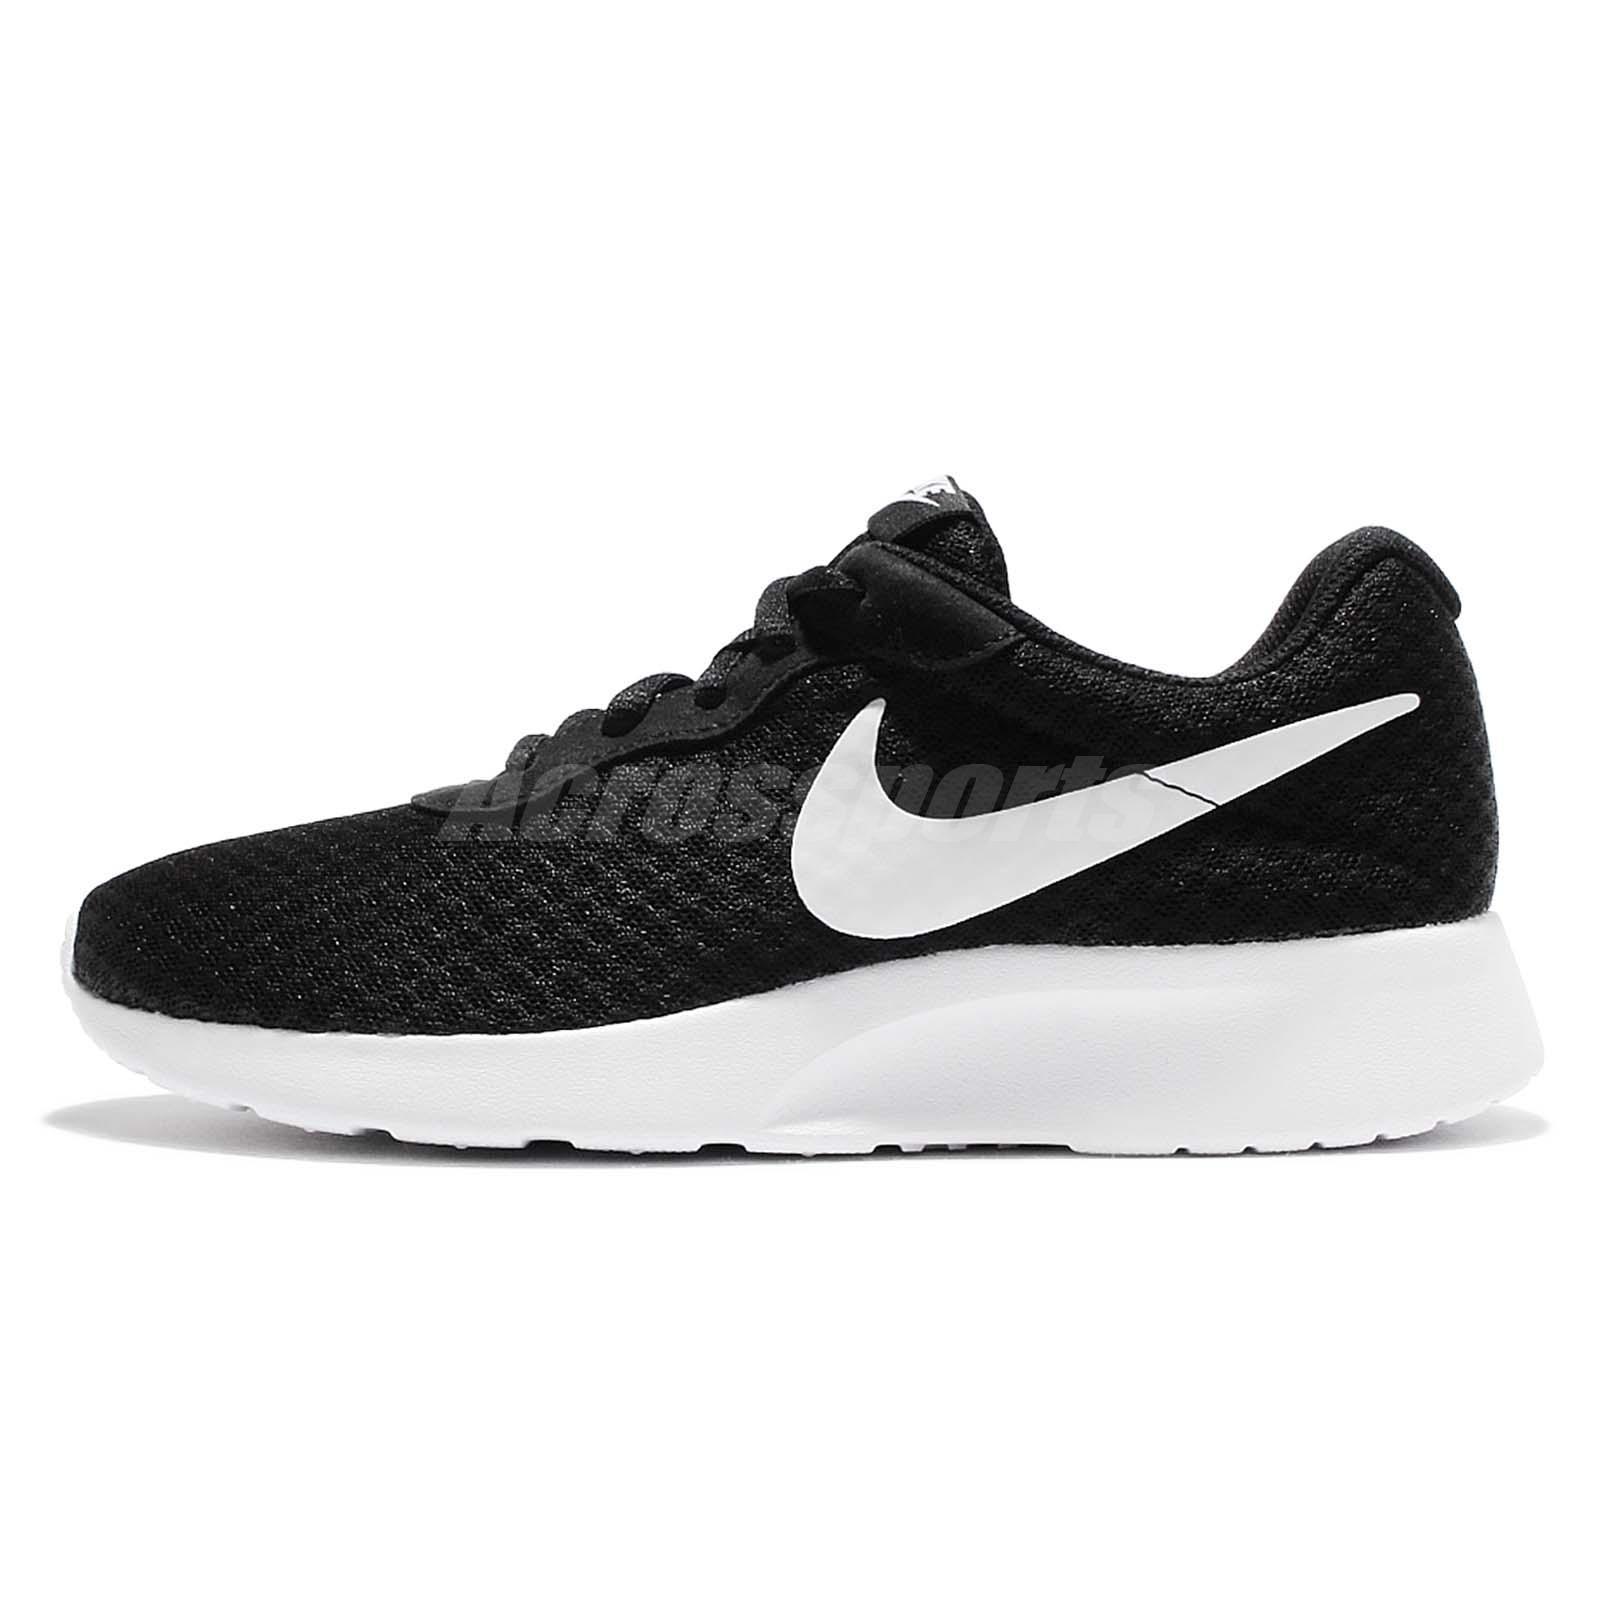 Wmns Nike Tanjun Black White NSW Sportswear Womens Running Shoes 812655-011